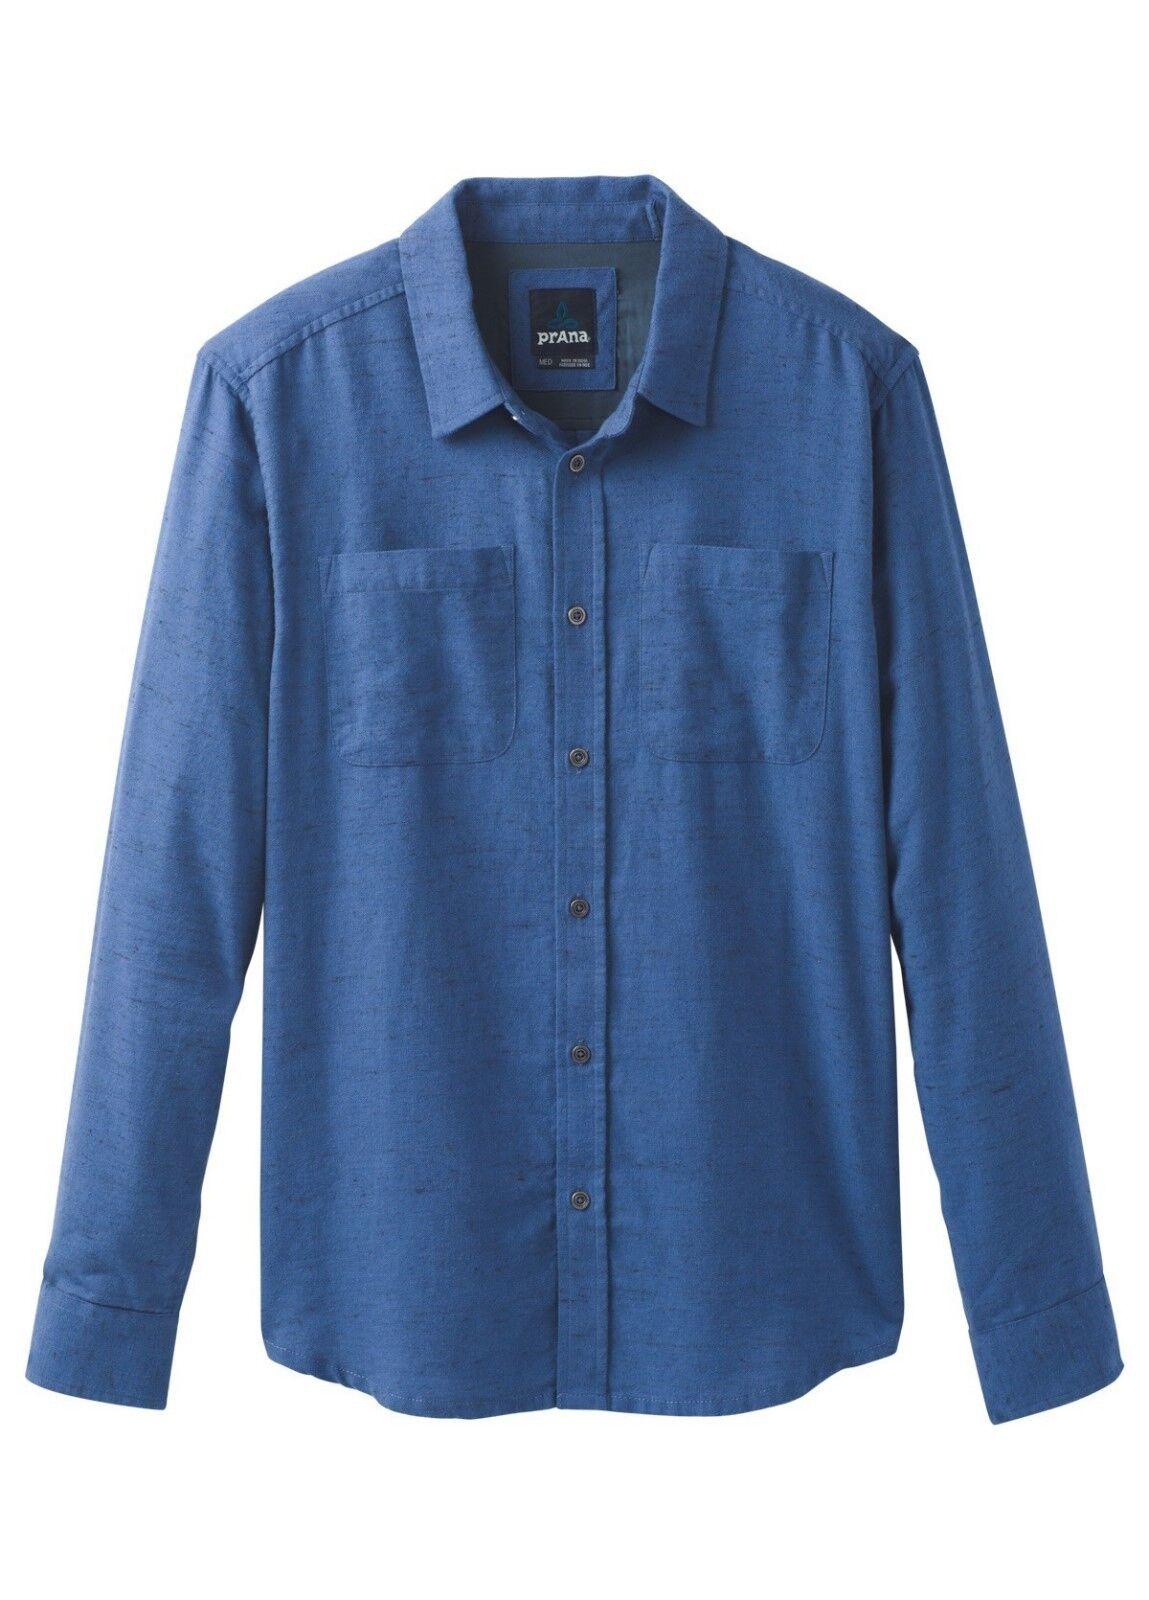 Prana Trey LS Flannel Shirt Langarm-Herrenhemd equinox Blau